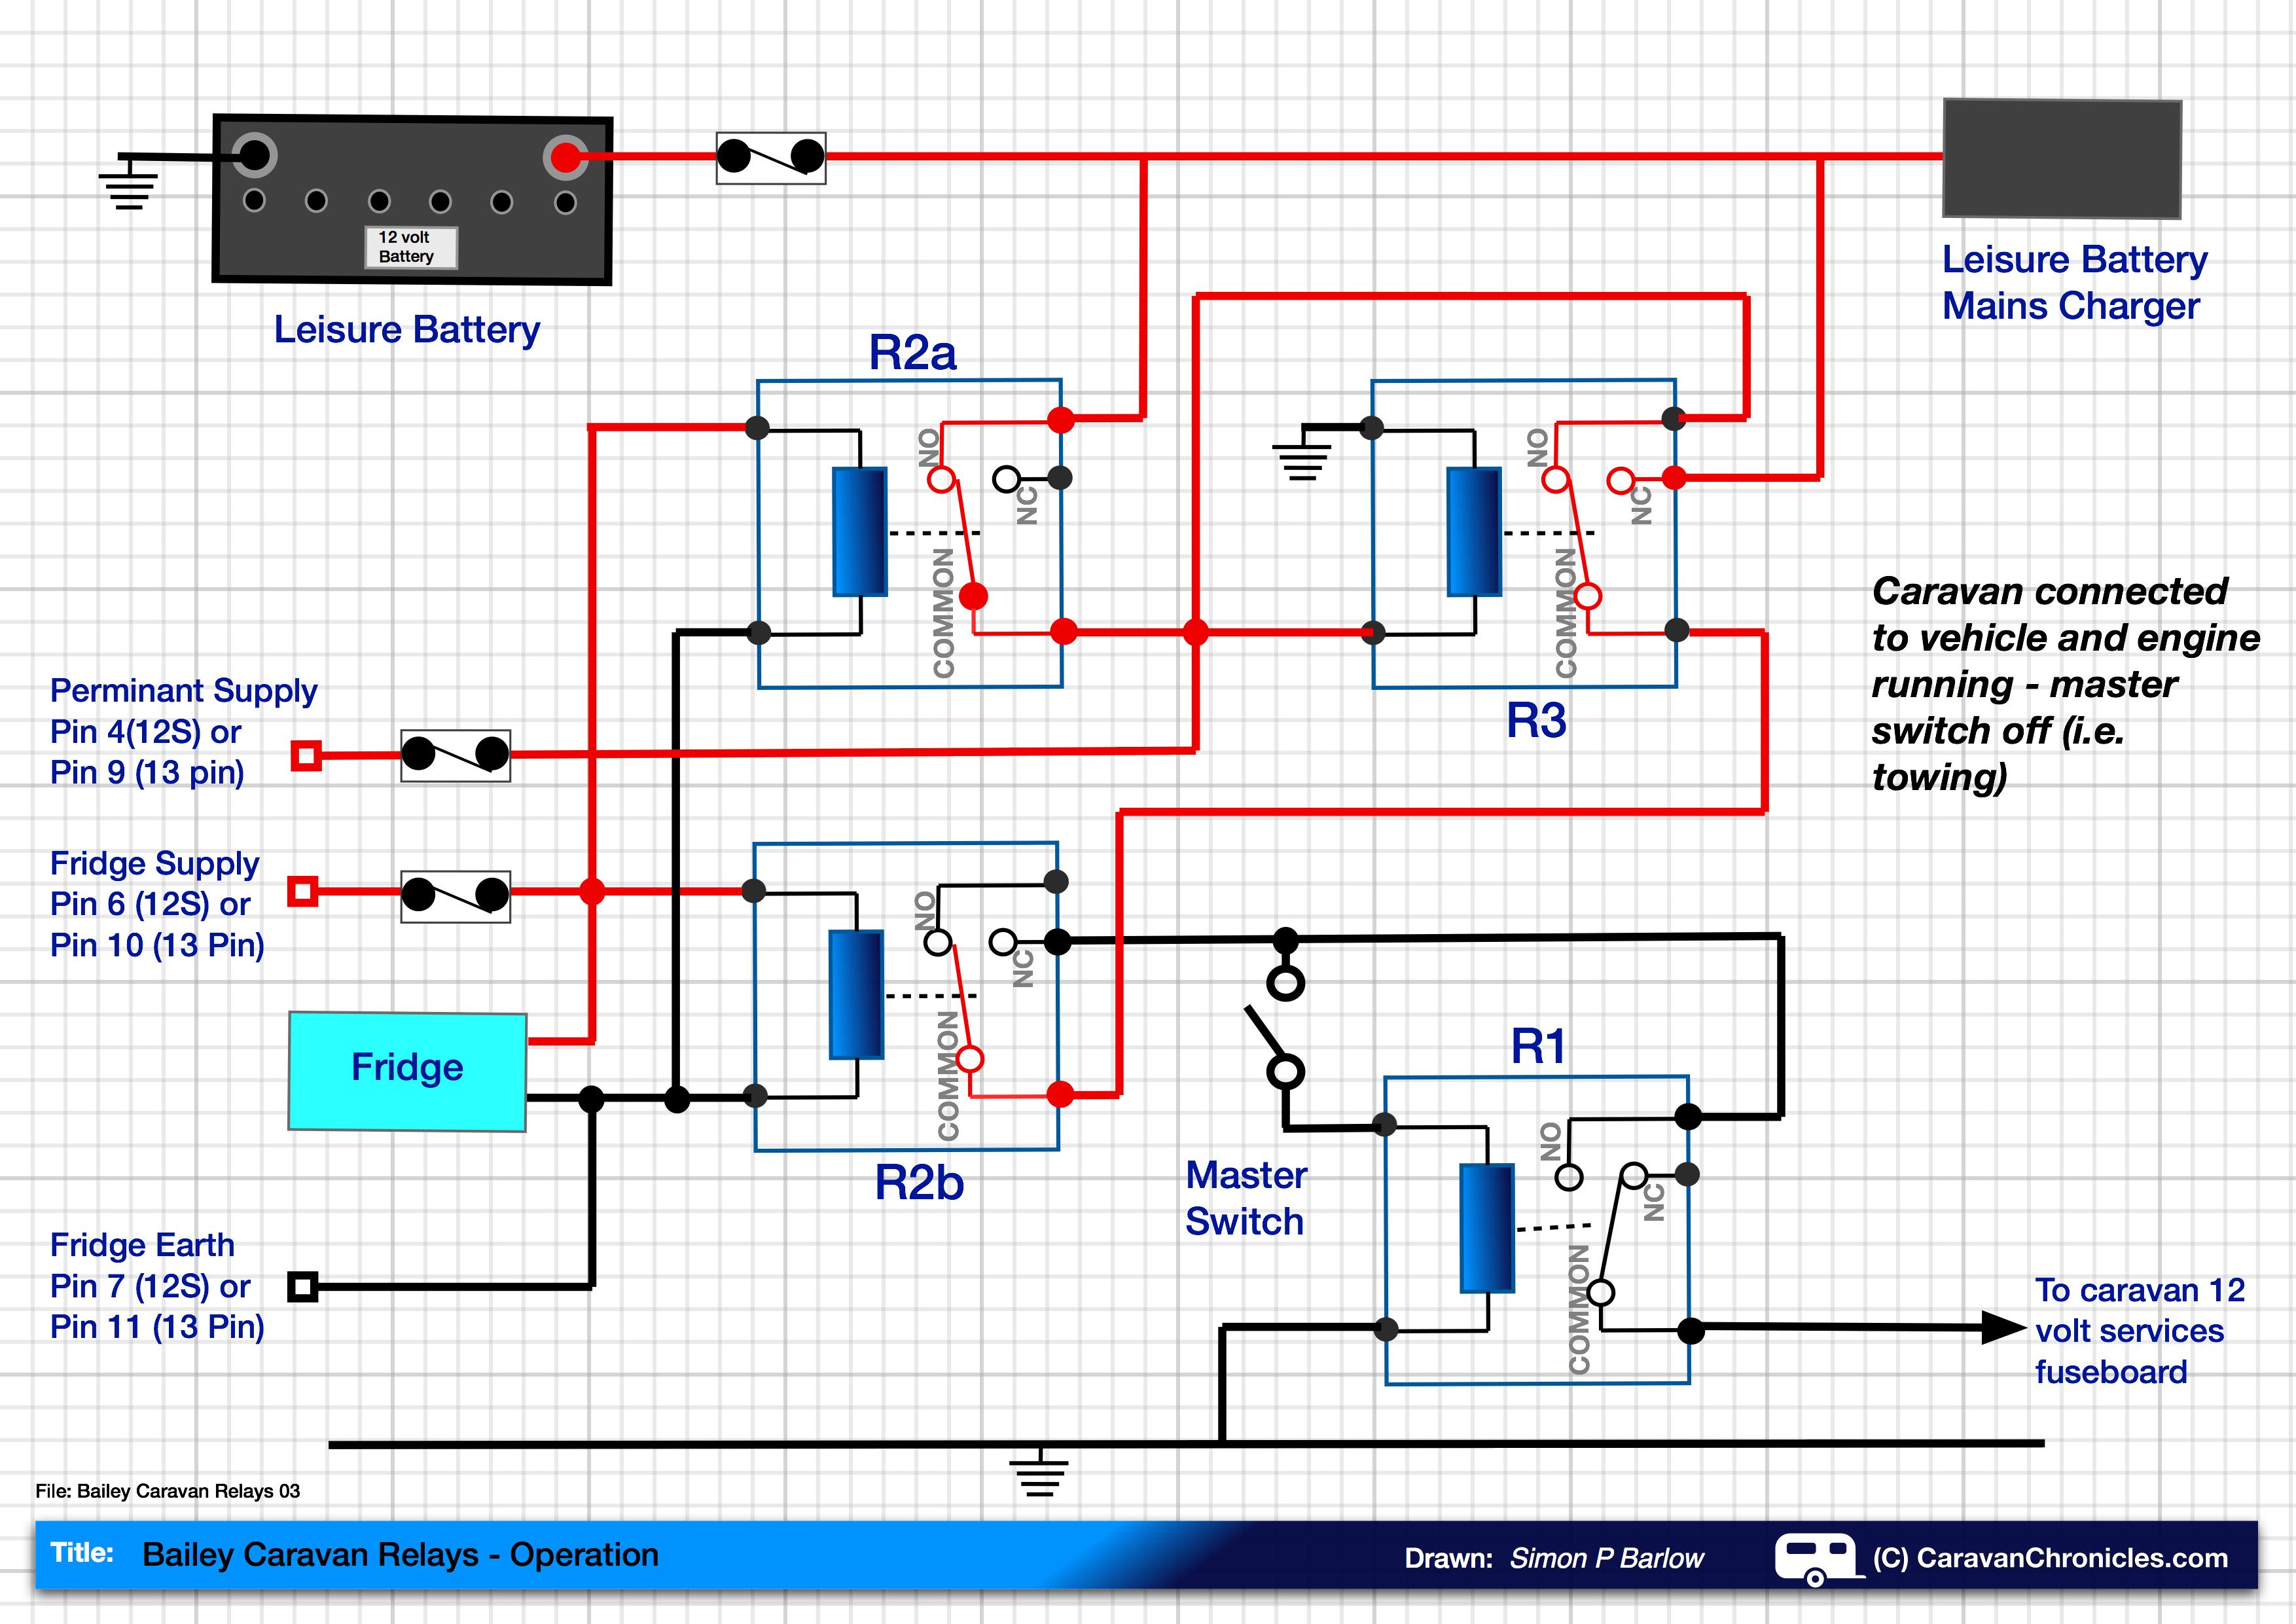 e24 wiring diagram internet of things diagrams transformer rh banyan palace com Nissan Caravan Engine Nissan Caravan Engine